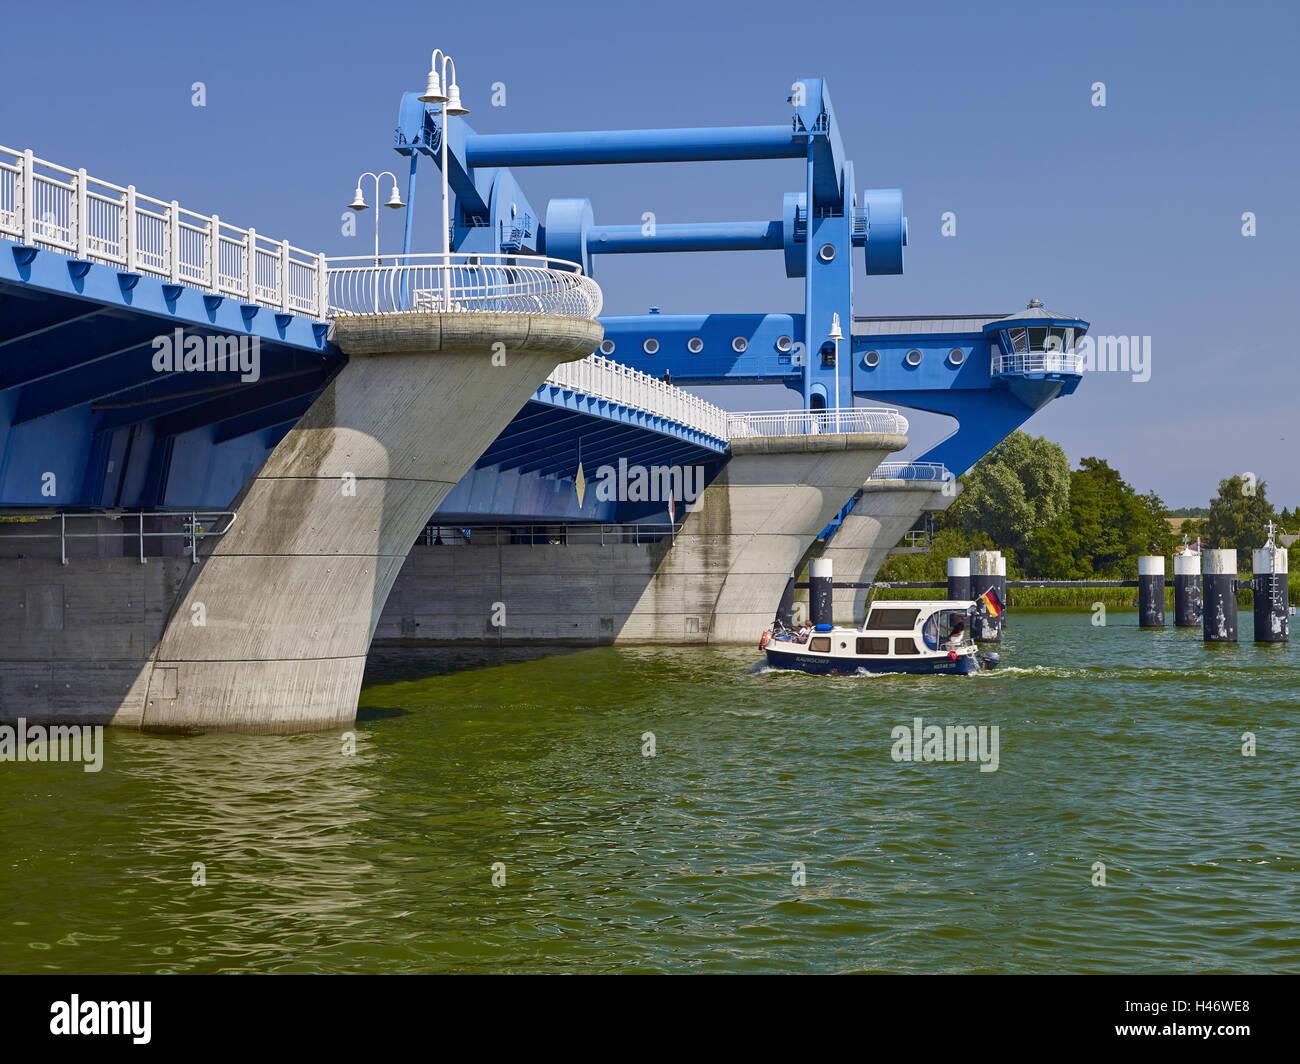 Bascule bridge over the Peene river, Wolgast, Mecklenburg-Western Pomerania, Germany - Stock Image